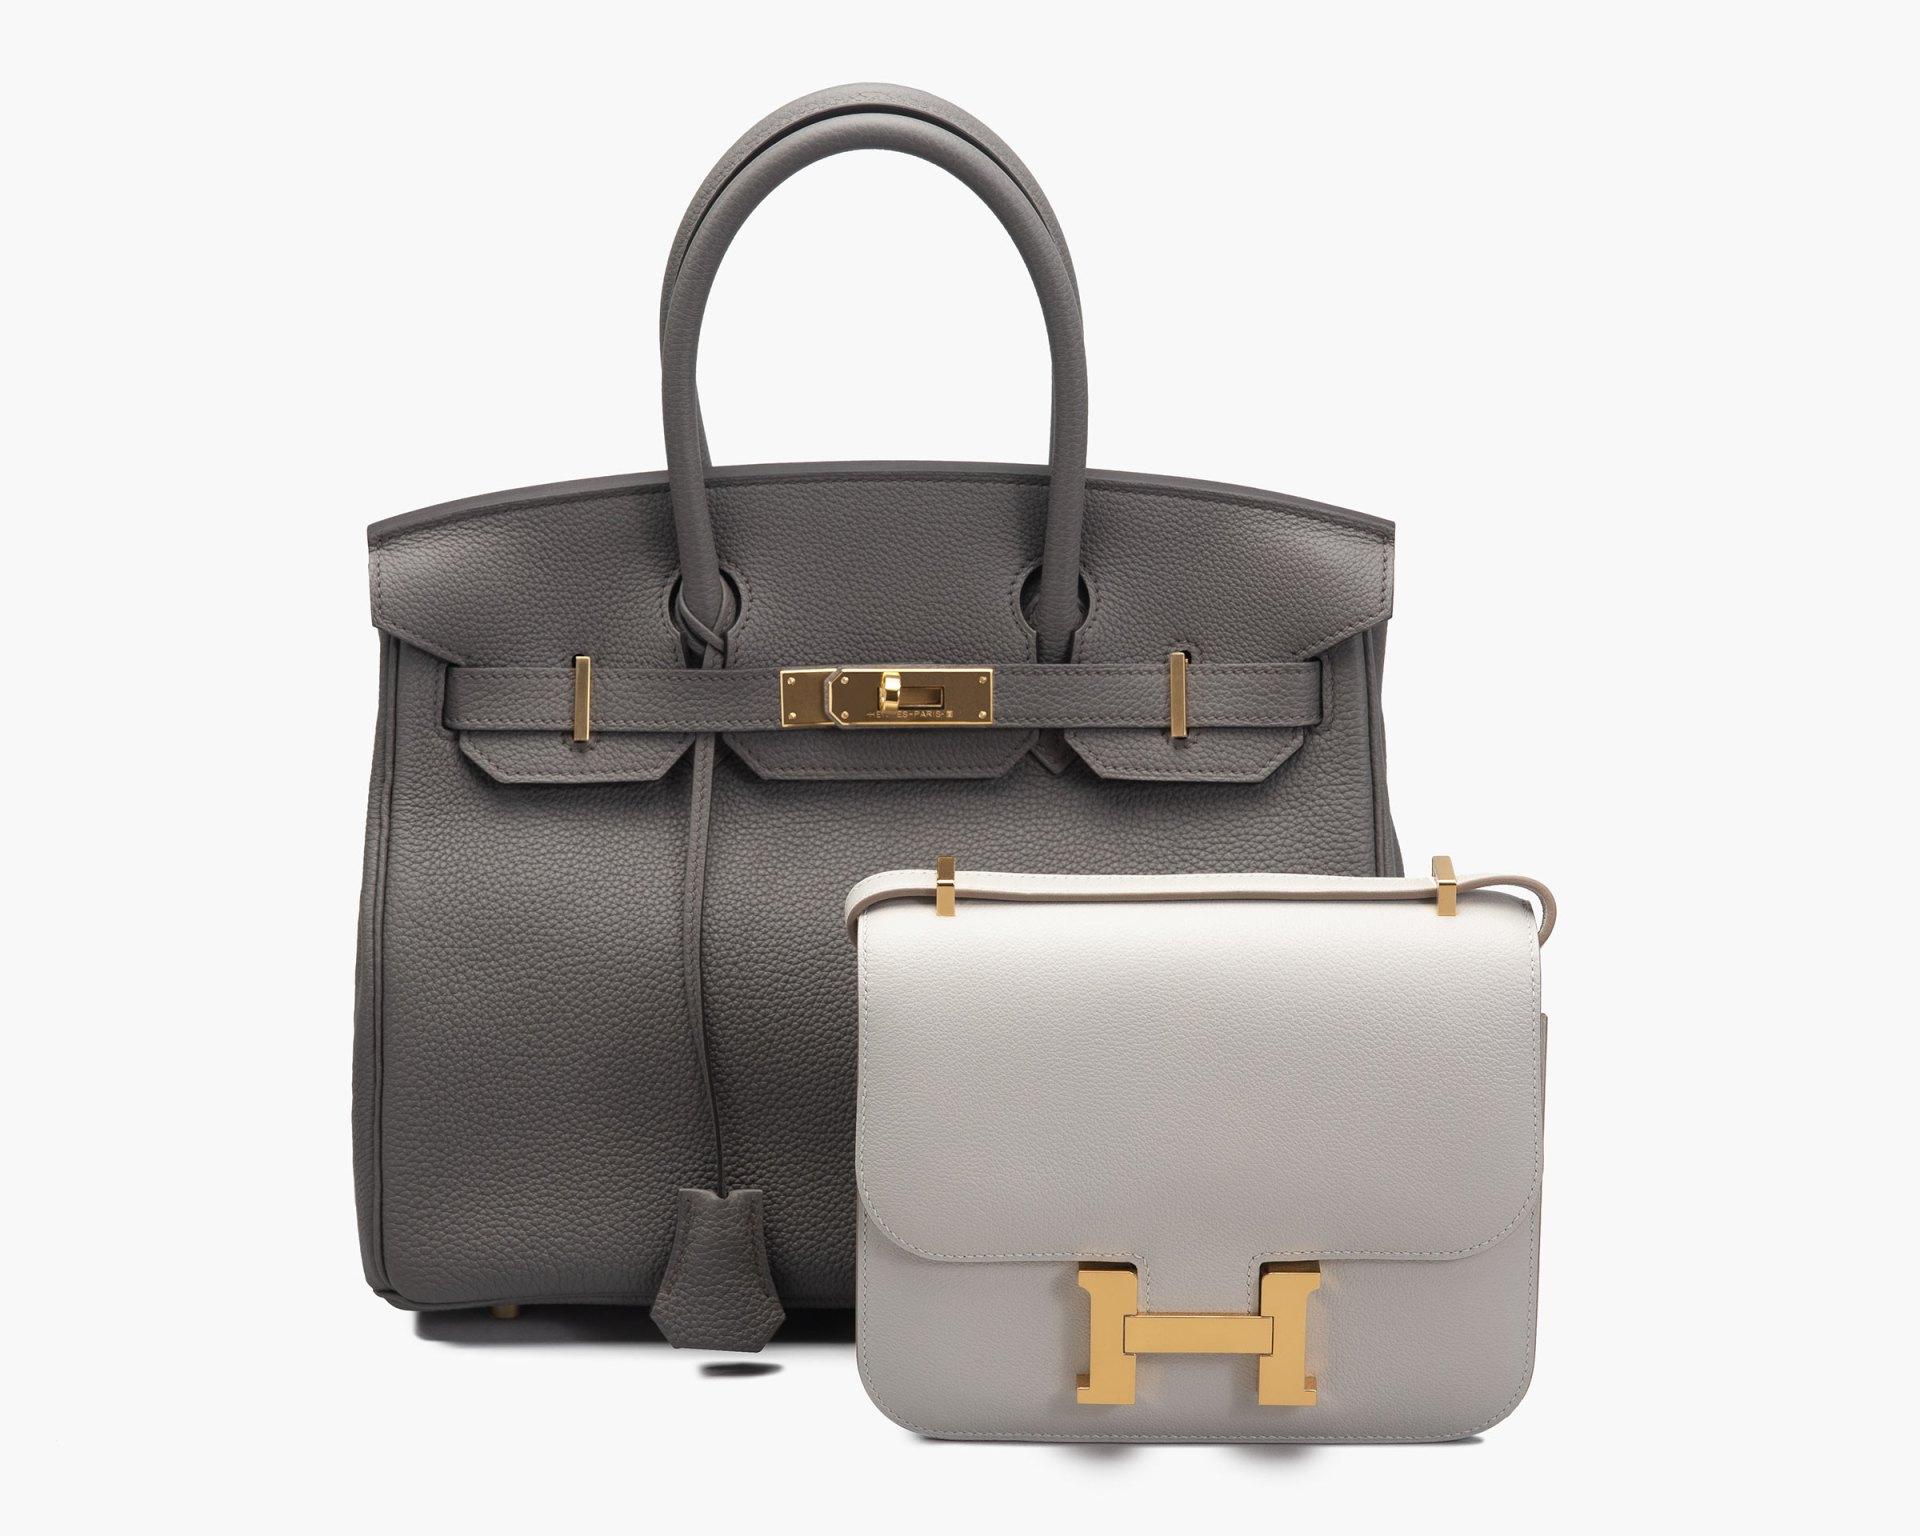 Studio image of Hermes Birkin bag and Clemence bag Grey FASHIONPHILE